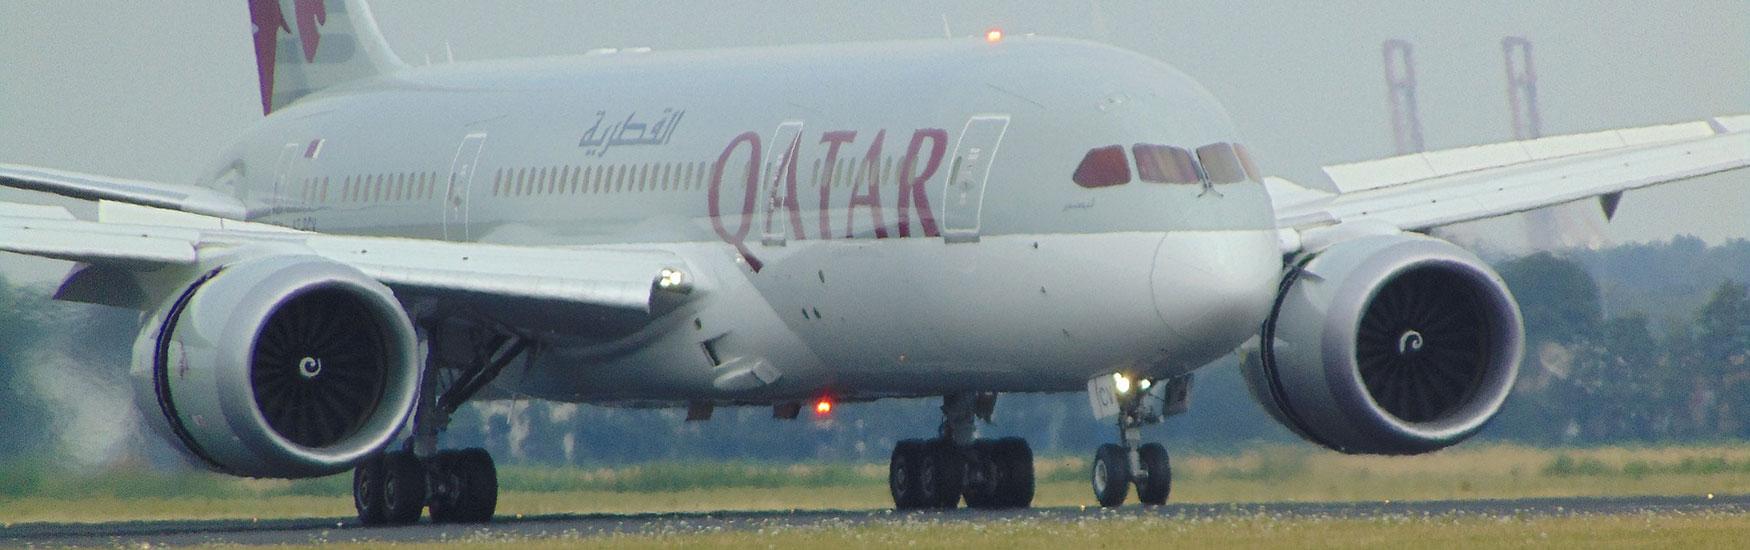 Qatar-Airlines.jpg